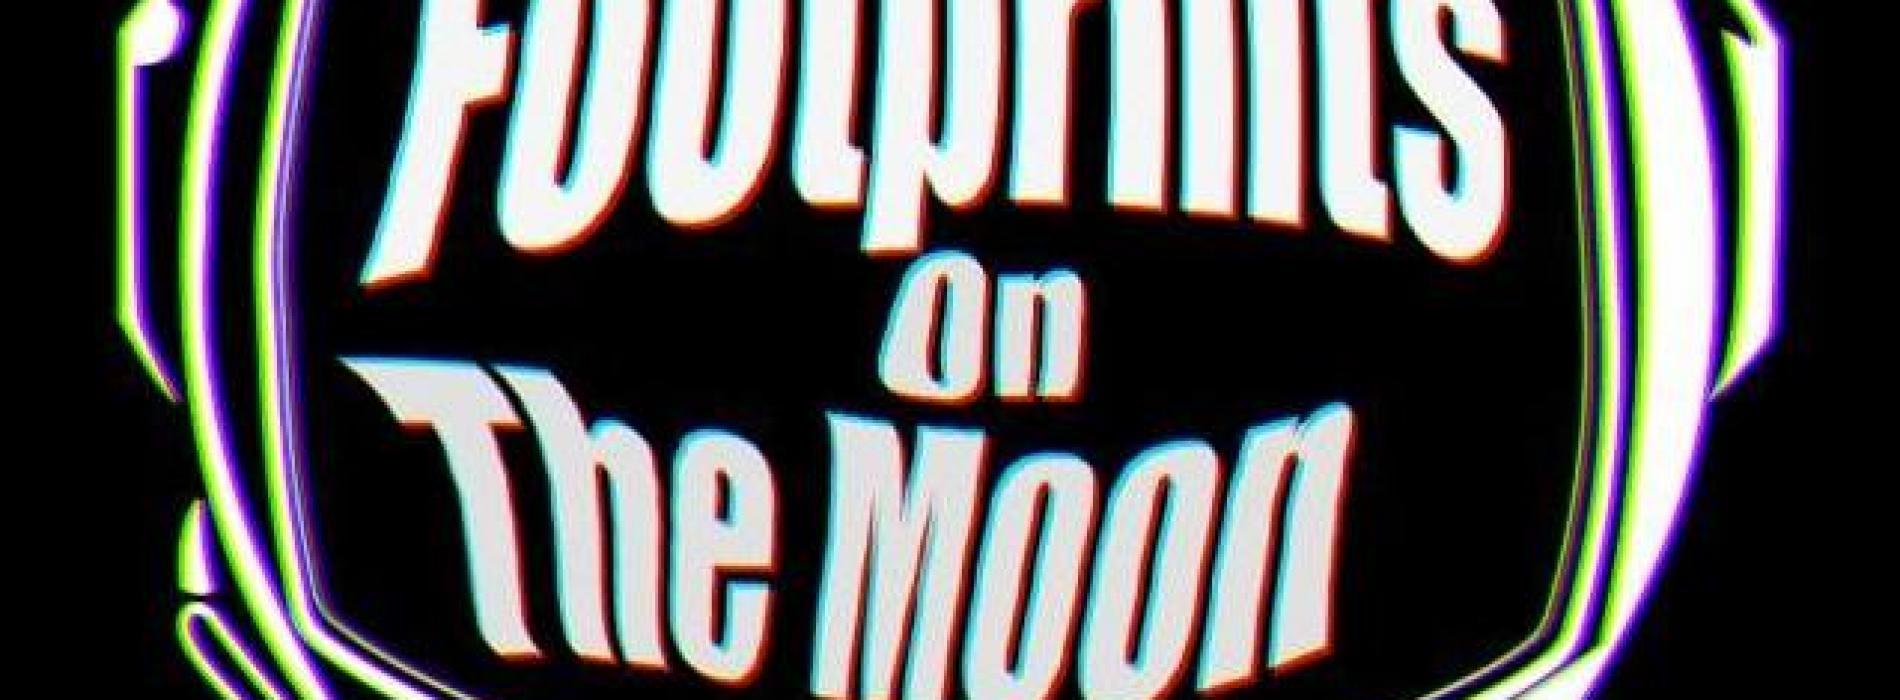 New Music : Sihinayak – Nadeeka Jayawardane/ Blue Night – MLTR (Cover by Footprints On The Moon ft Adish)